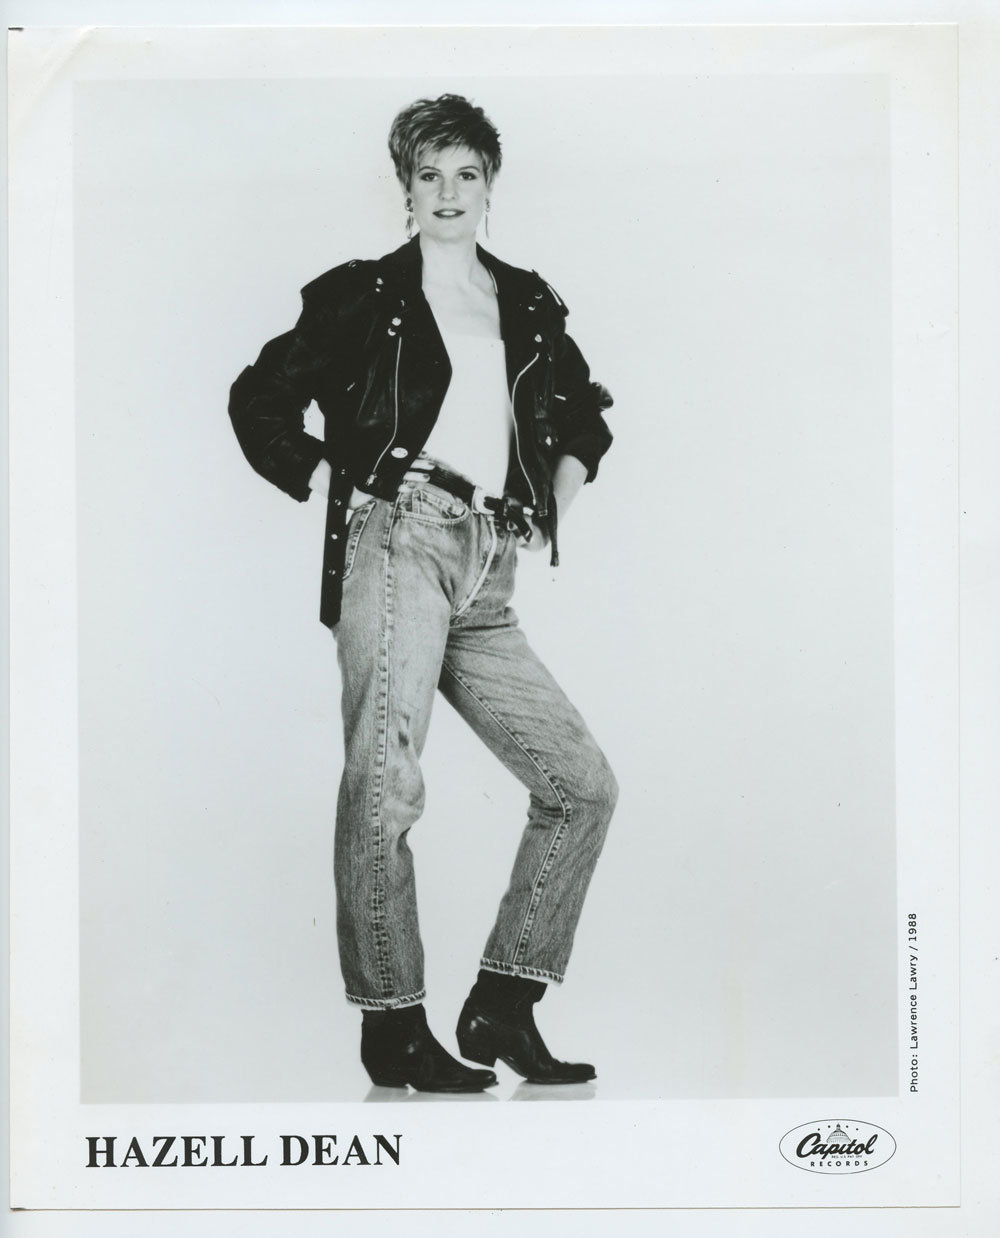 Hazell Dean Photo 1987 Publicity Promo Capital Records